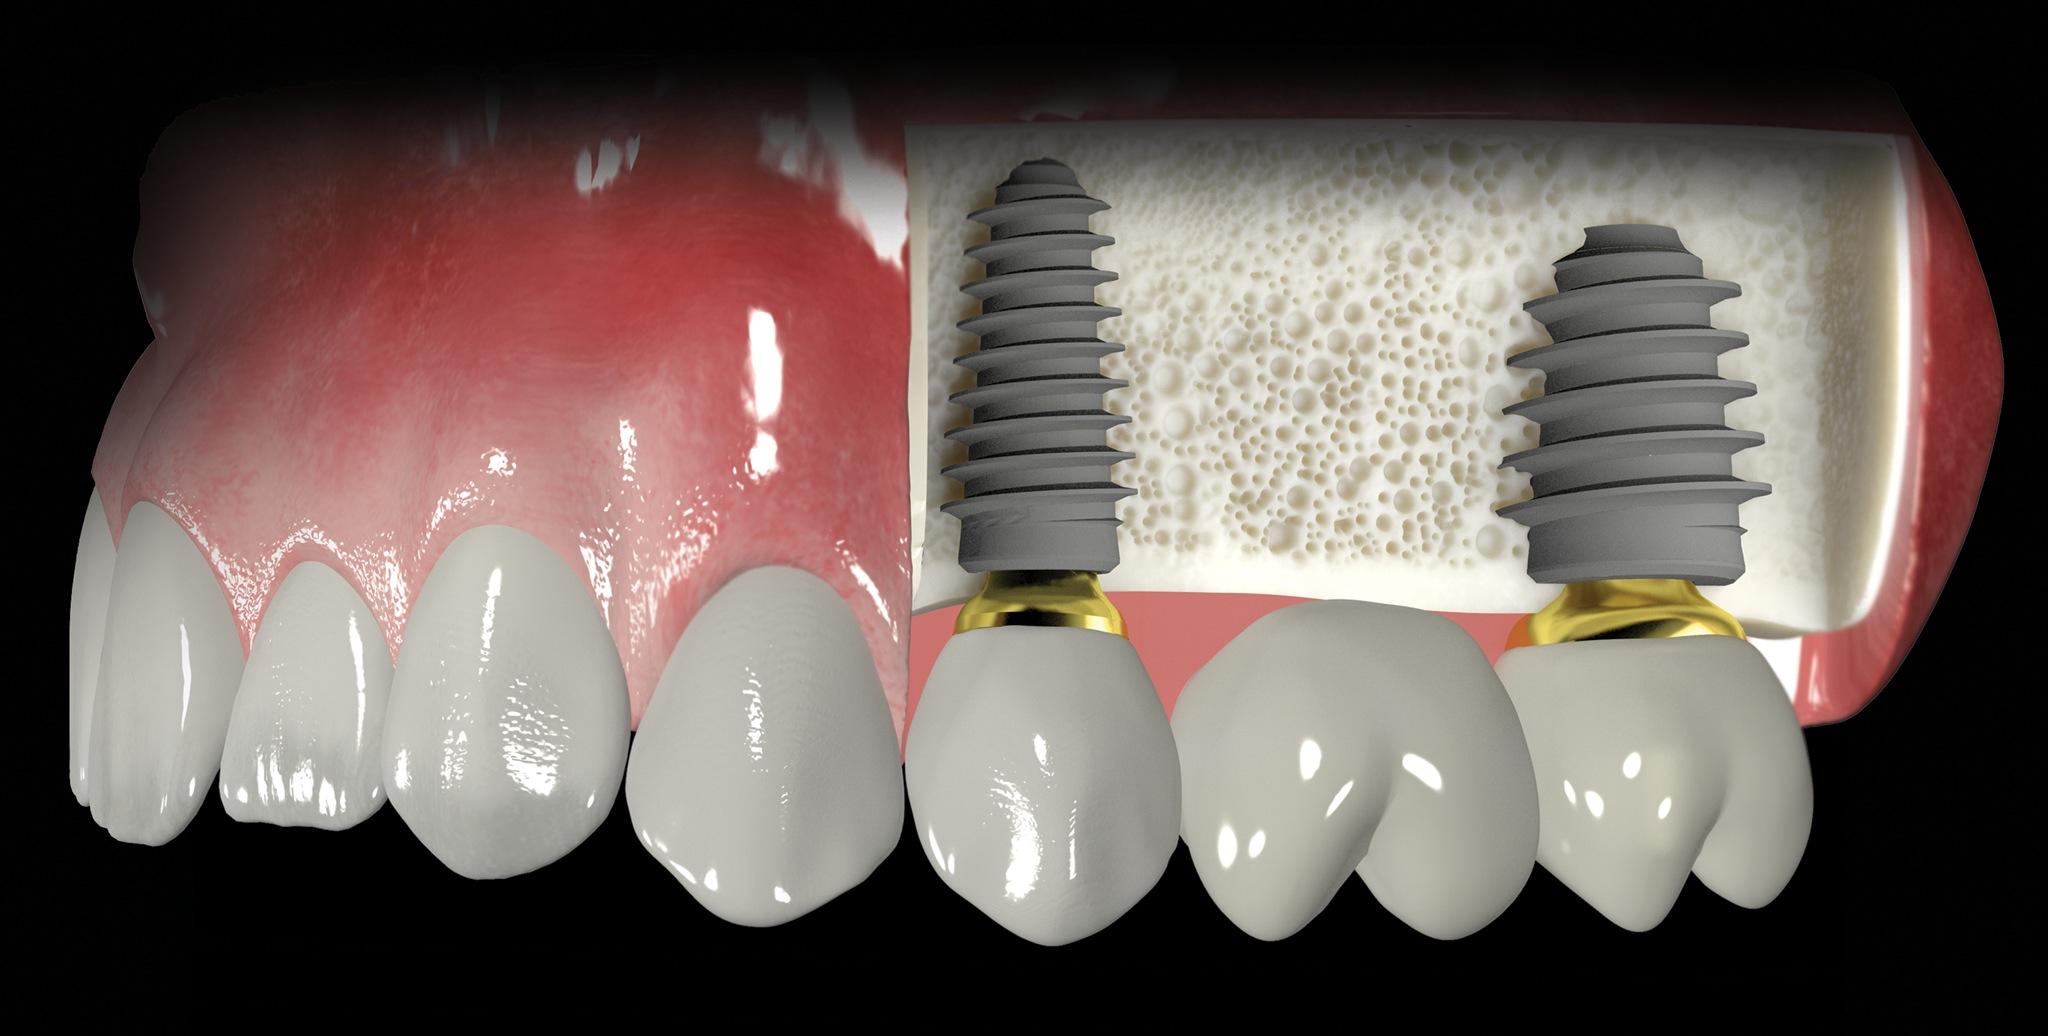 Oral Implantology Photo